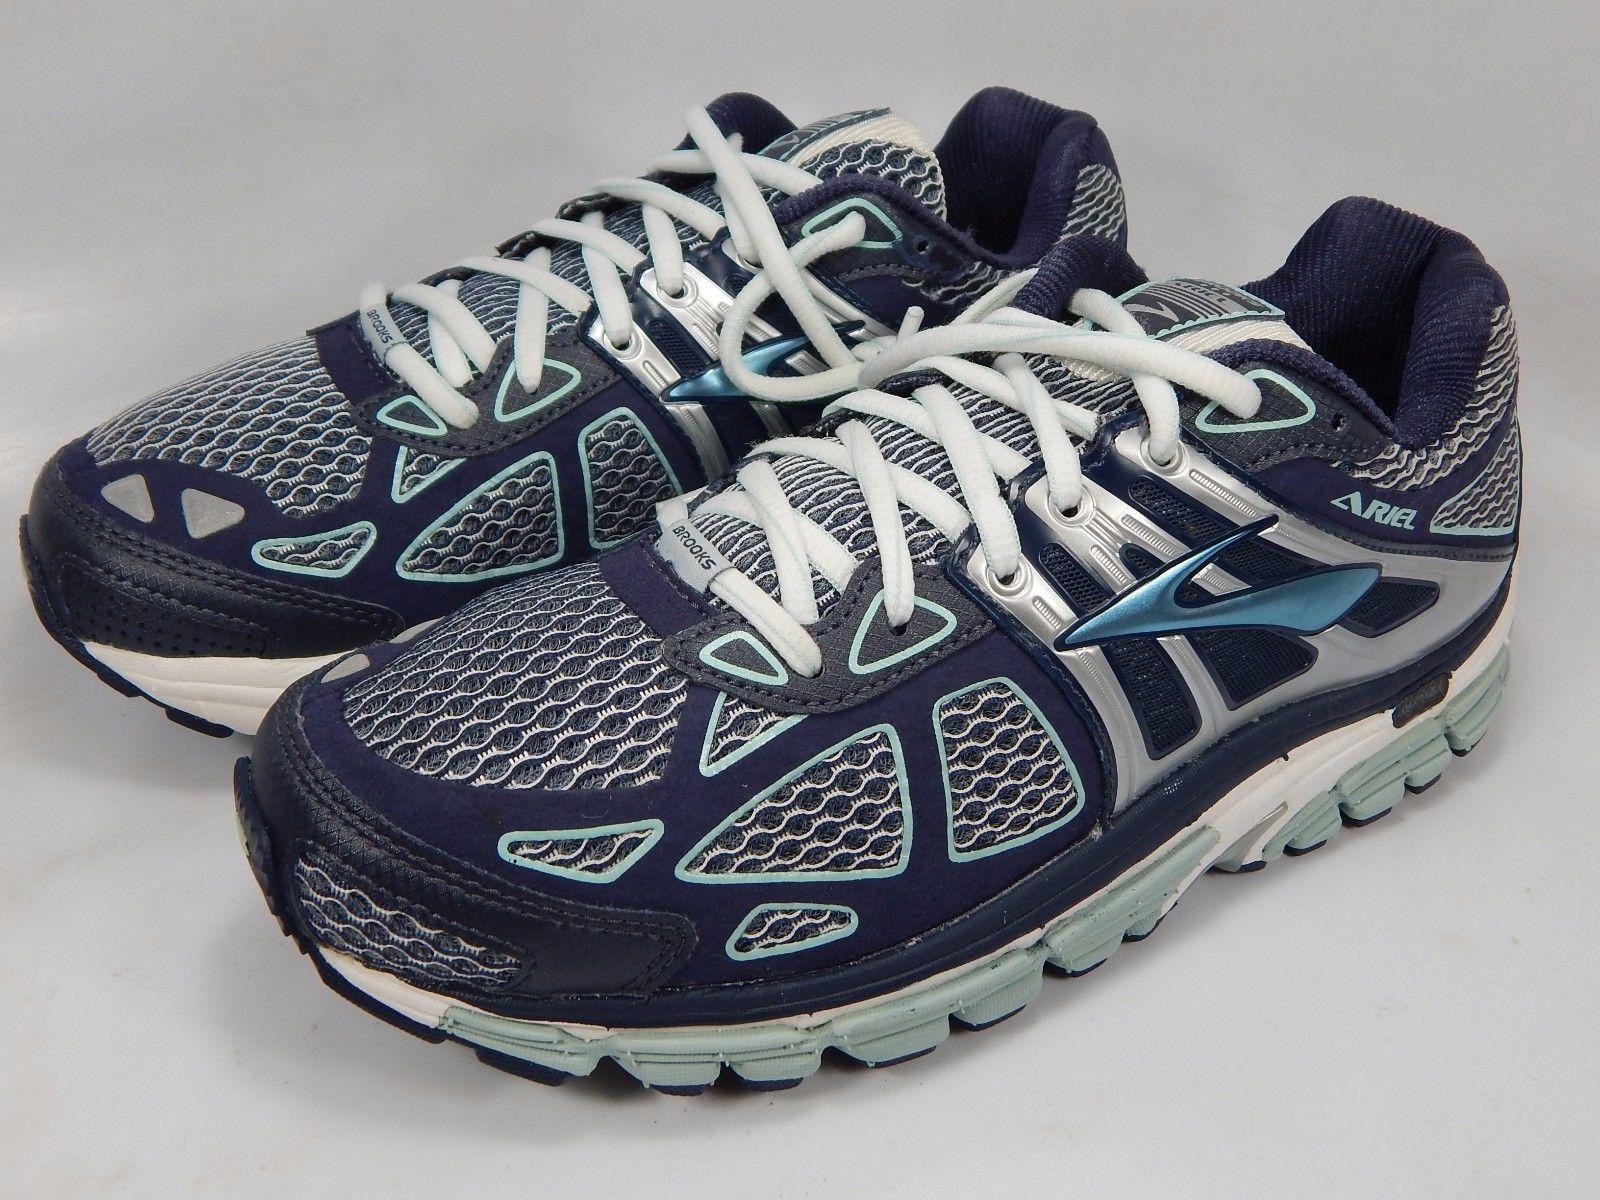 Brooks Ariel 14 Women's Running Shoe Size US 8.5 M (B) EU 40 Blue  1201641B399